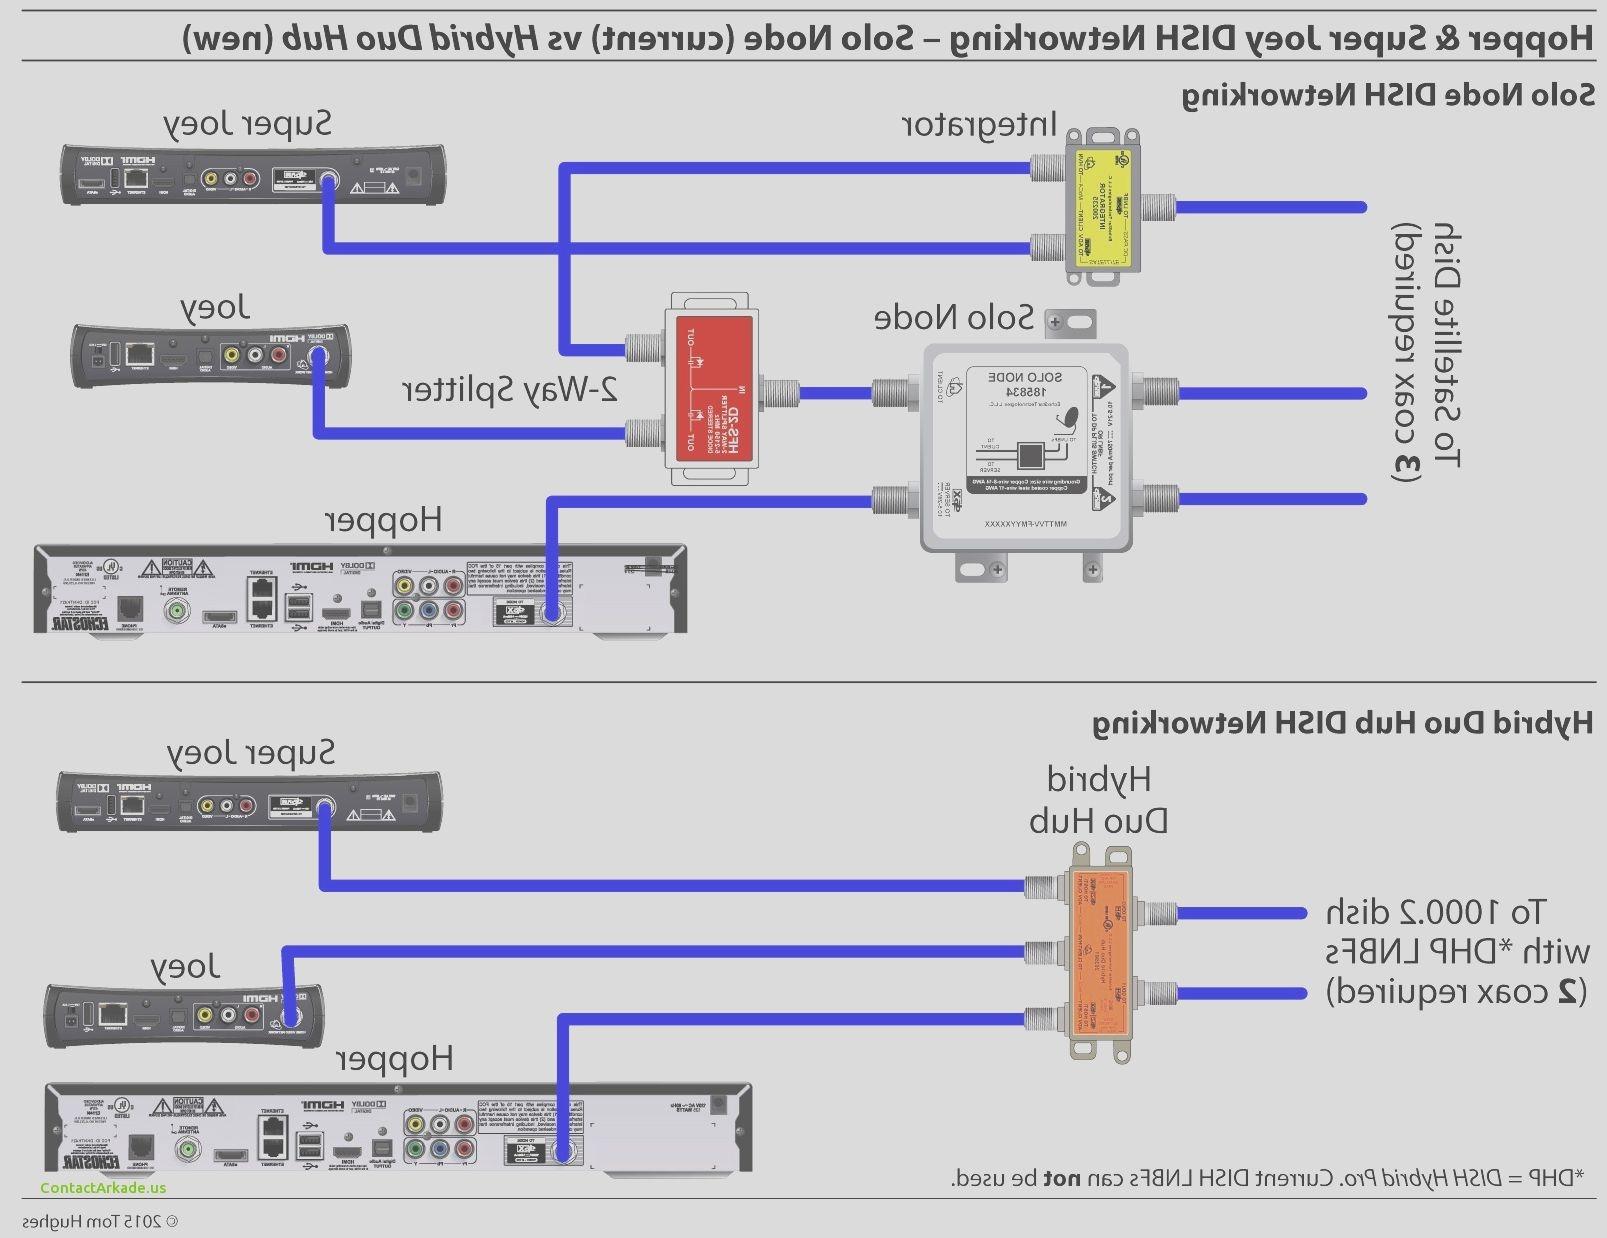 dish hopper joey wiring diagram Download-Hopper Super Joey Wiring Diagram Download Dish Wiring Diagram Fresh Dish Network Wiring Diagrams Circuit 18-g